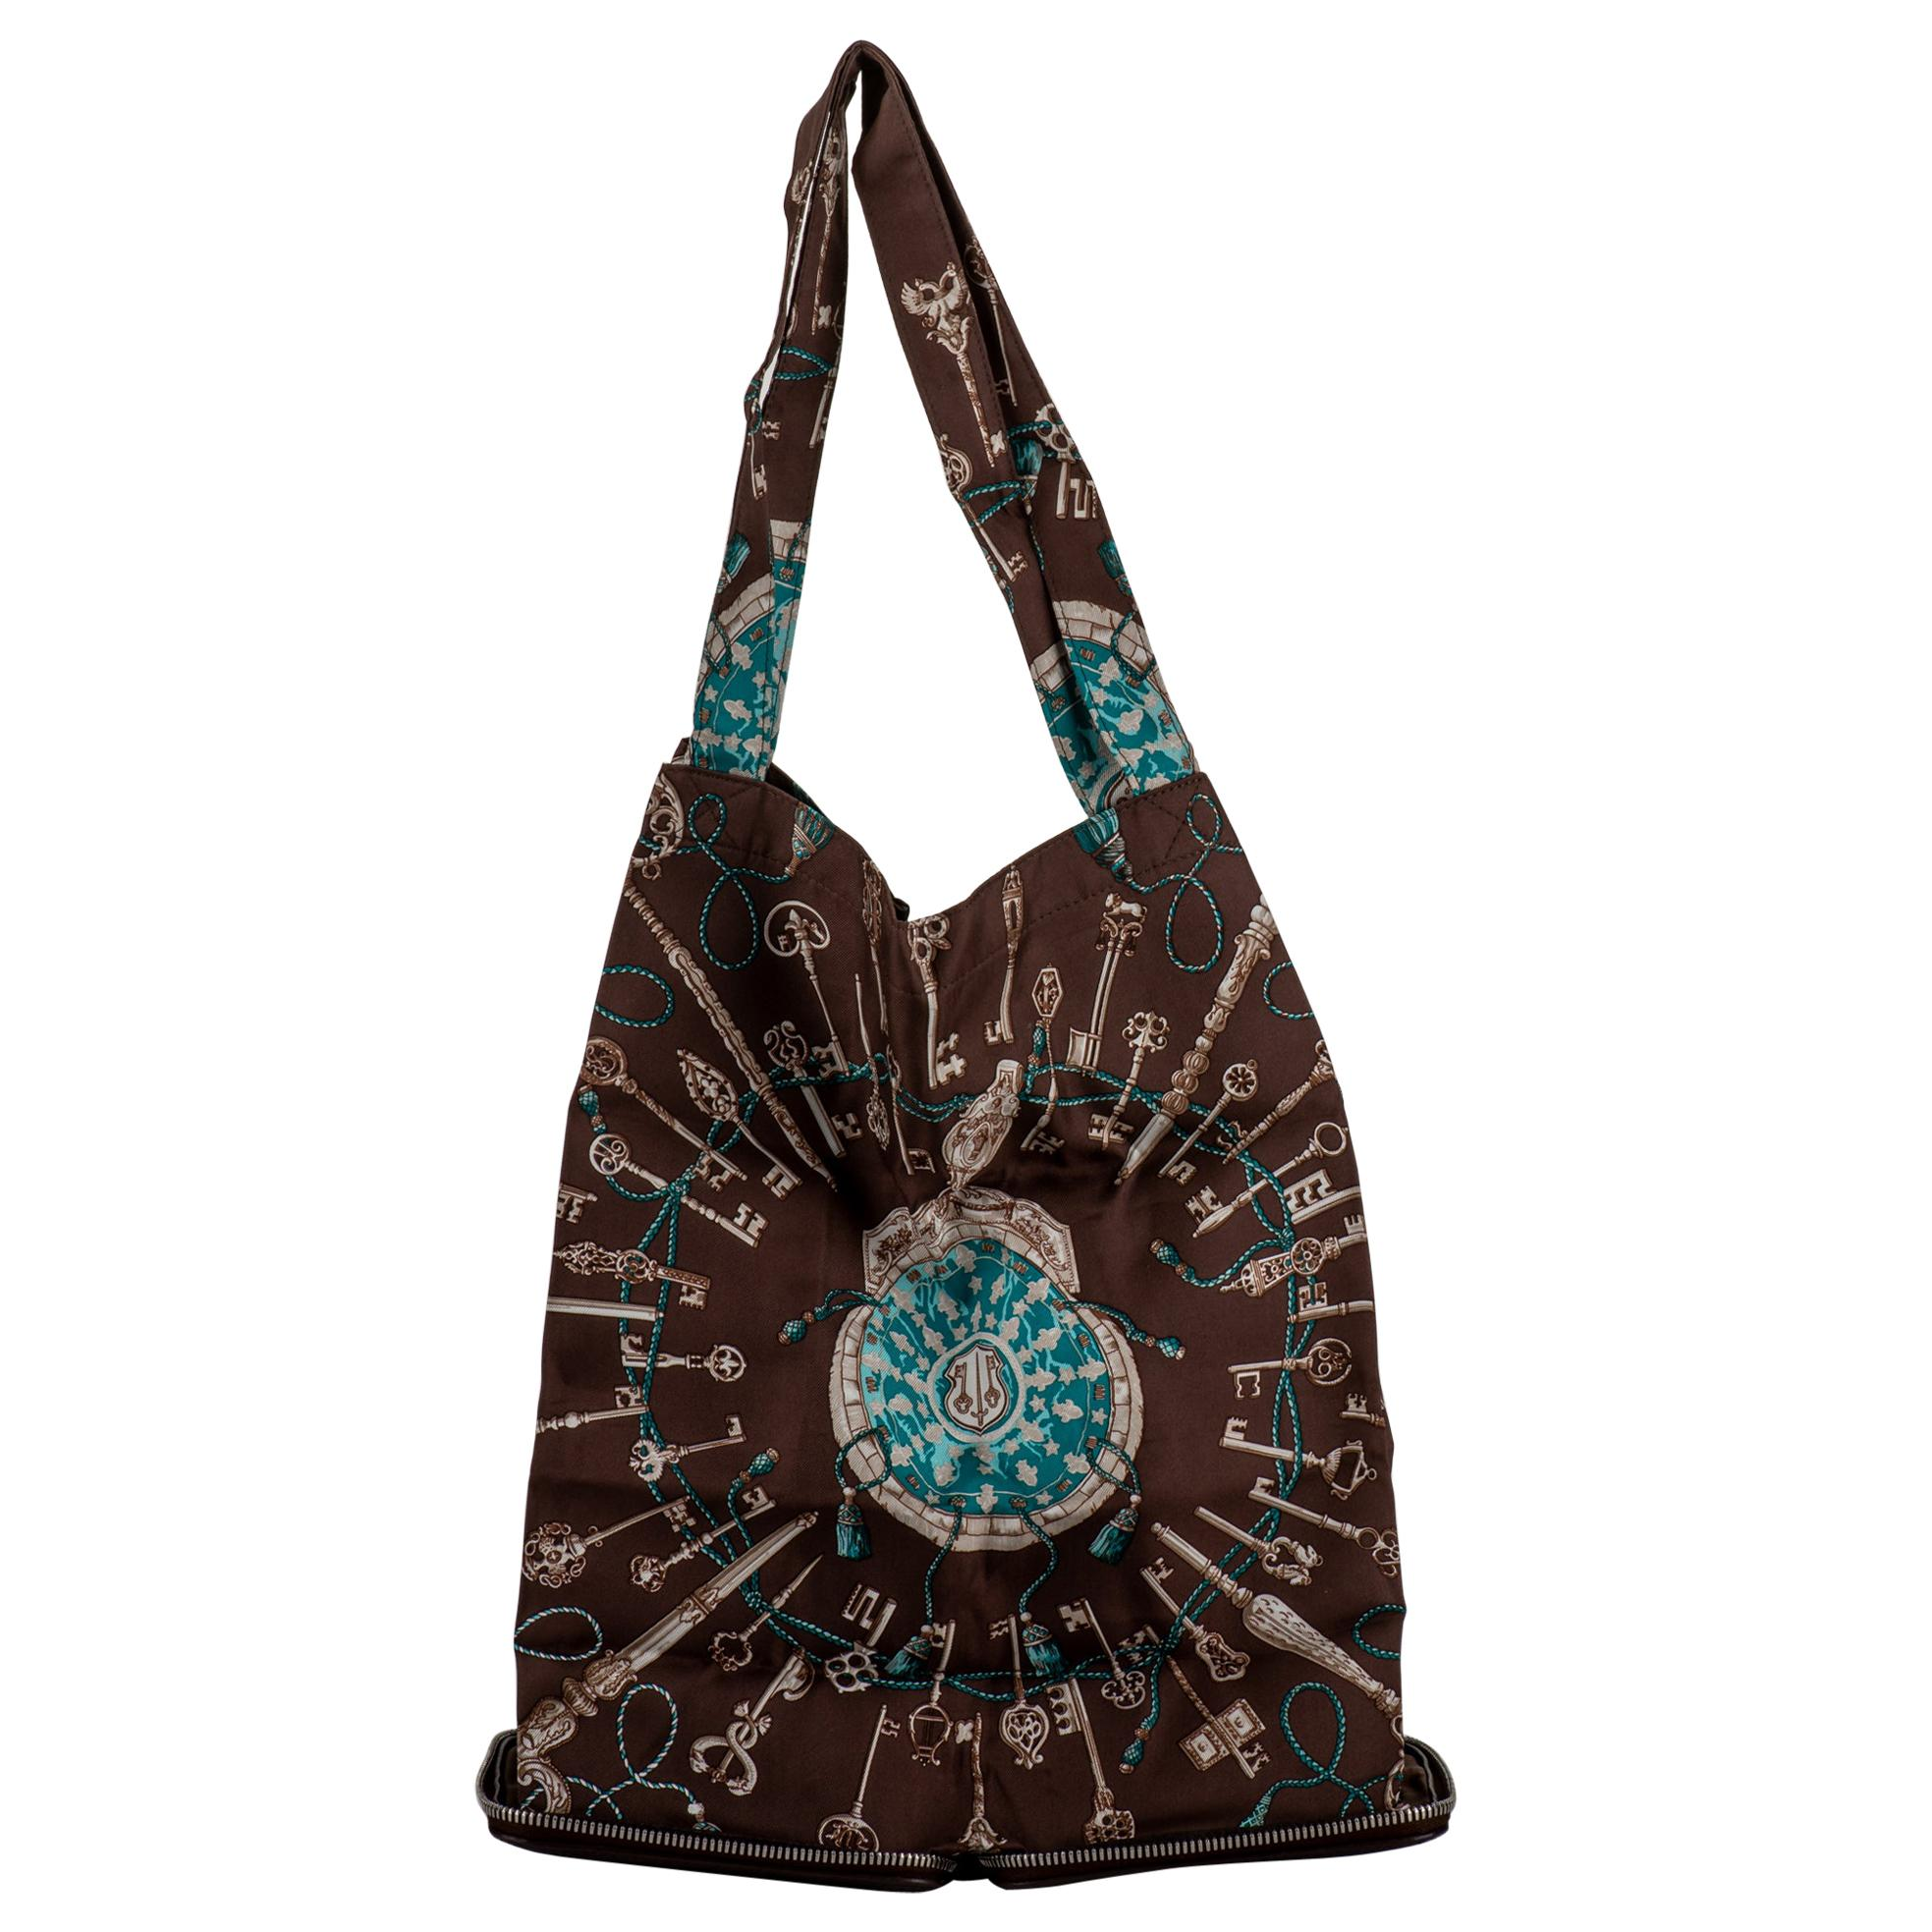 Hermès Brown Les Clefs Silky Pop Bag